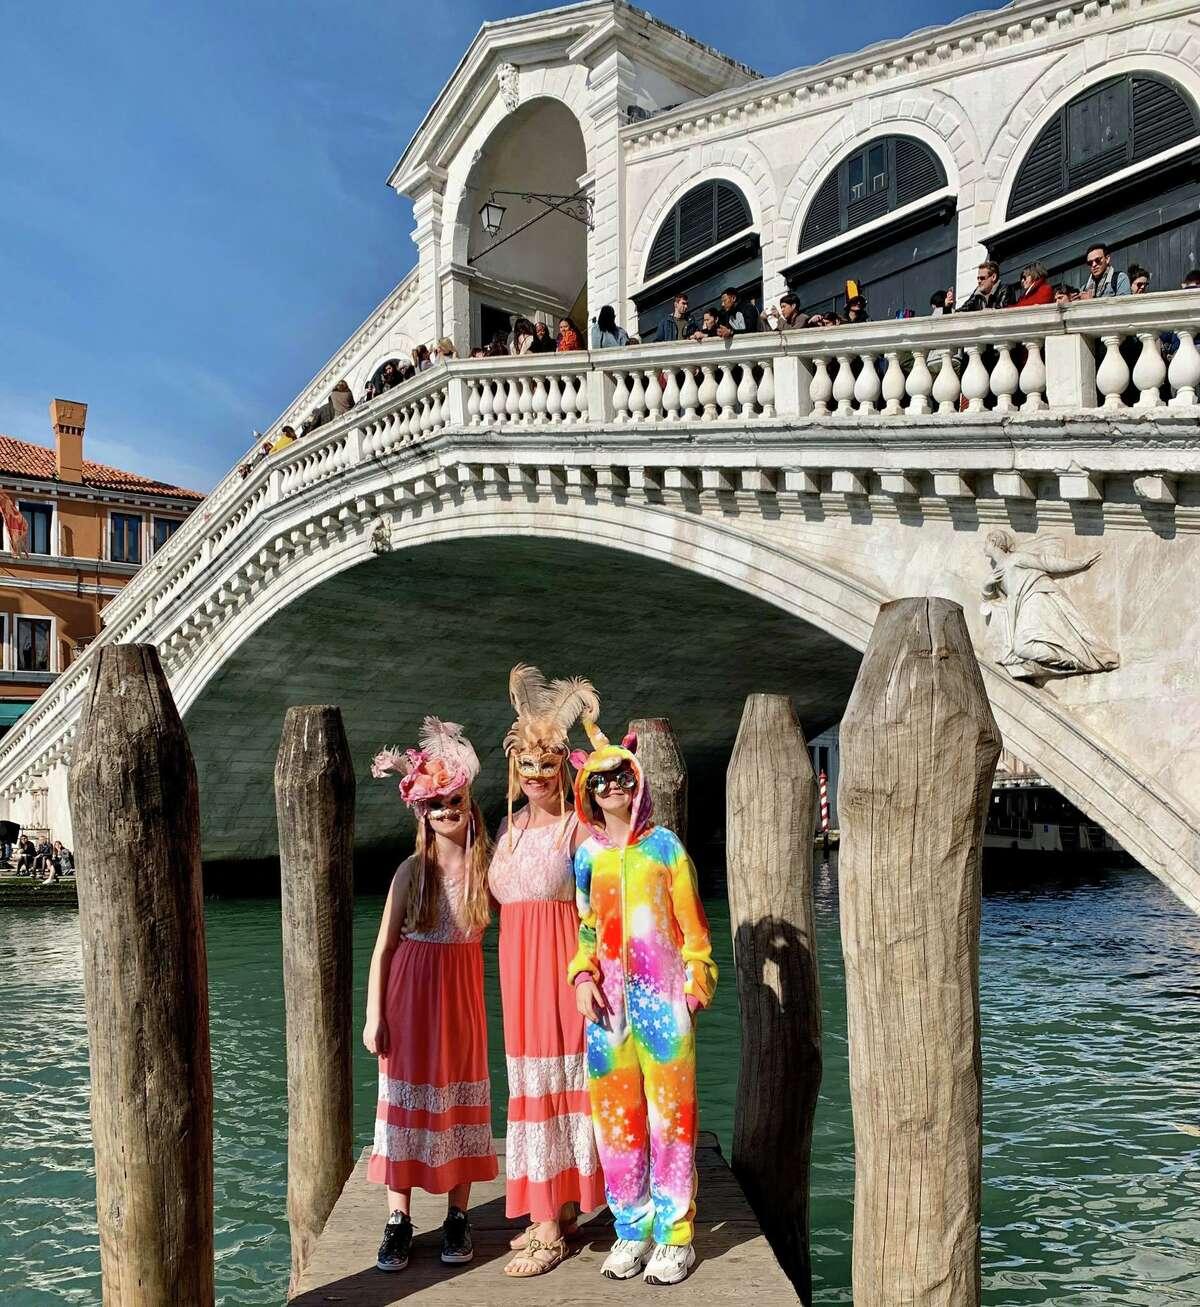 MegZugelder and her kidsat Carnevale in Venice the week before the coronavirus measures began taking place.